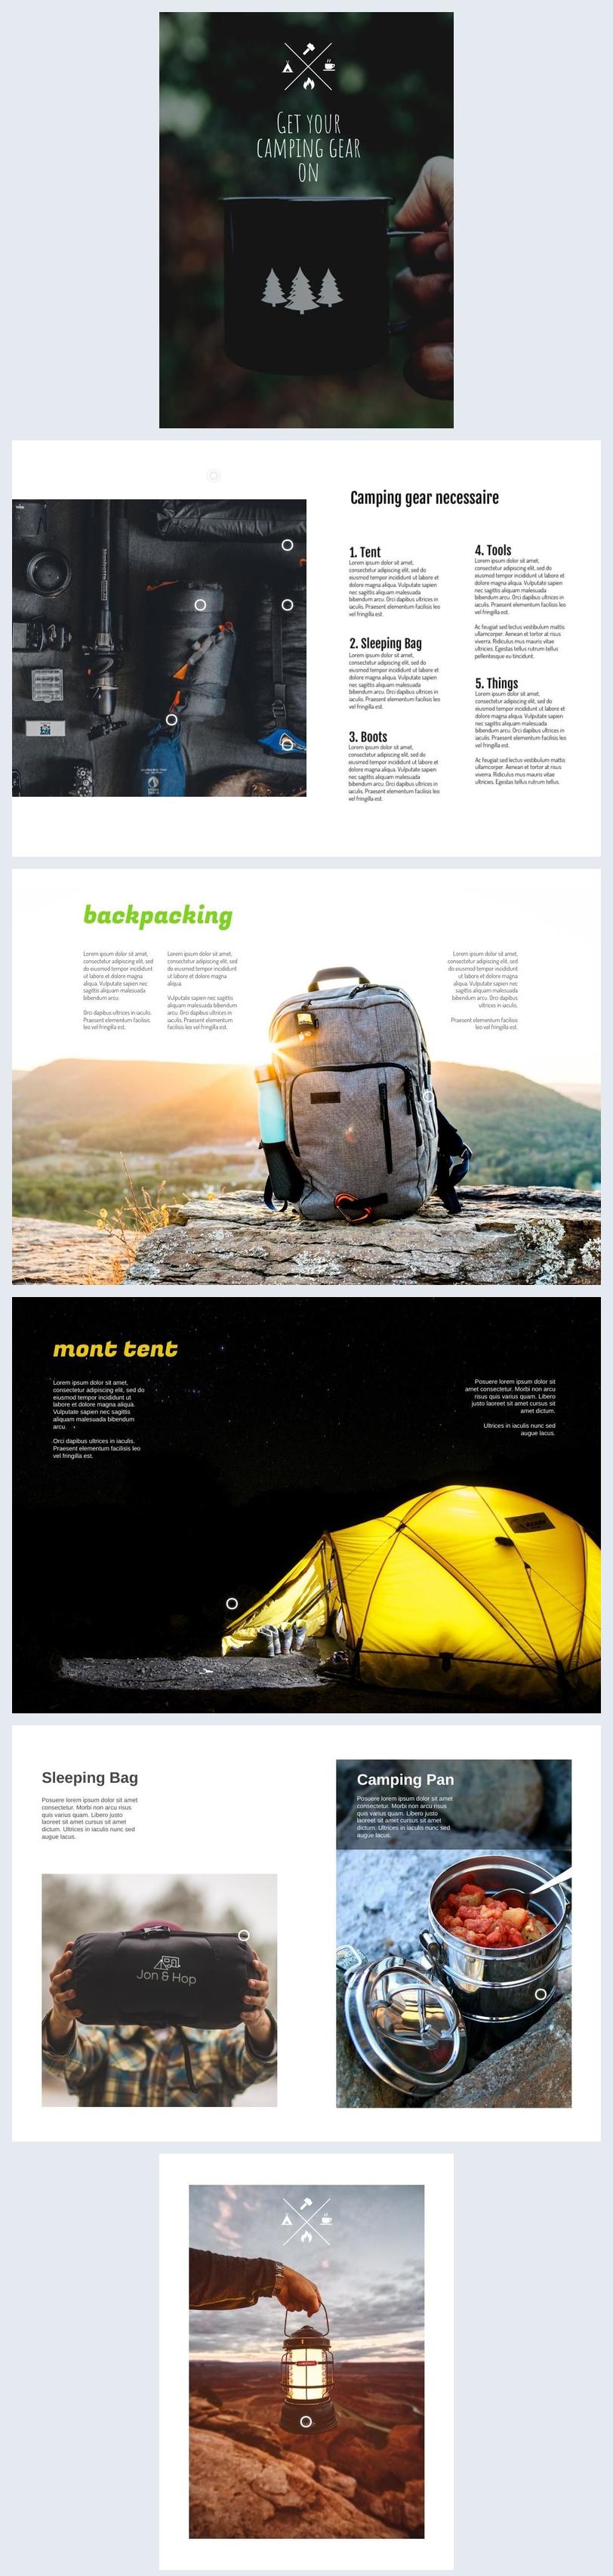 Design de Brochura de Catálogo de Equipamentos de Acampamento